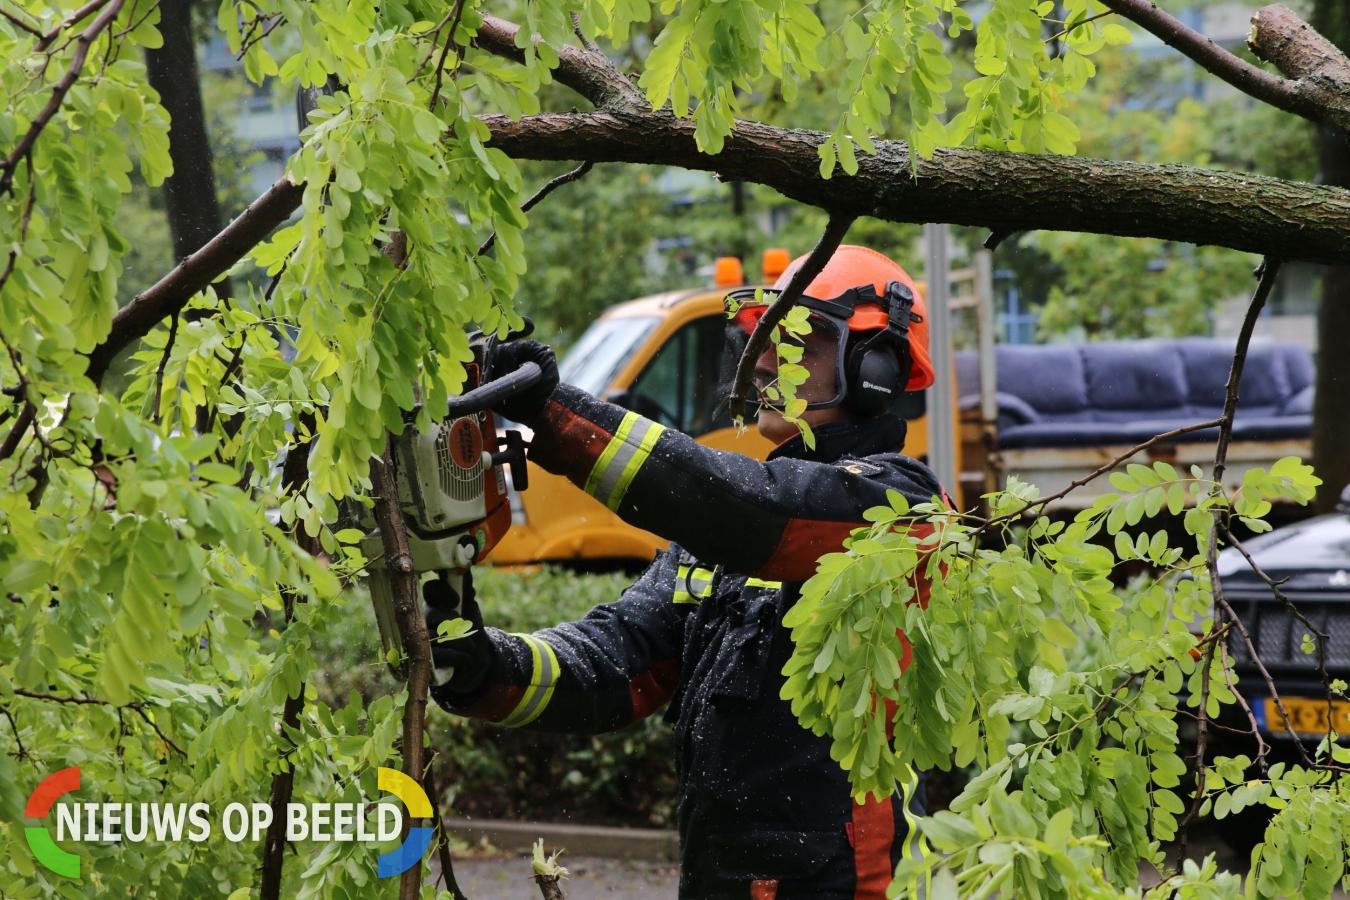 Overzicht van stormschade in Leiden, Leiderdorp, Warmond en Oegstgeest